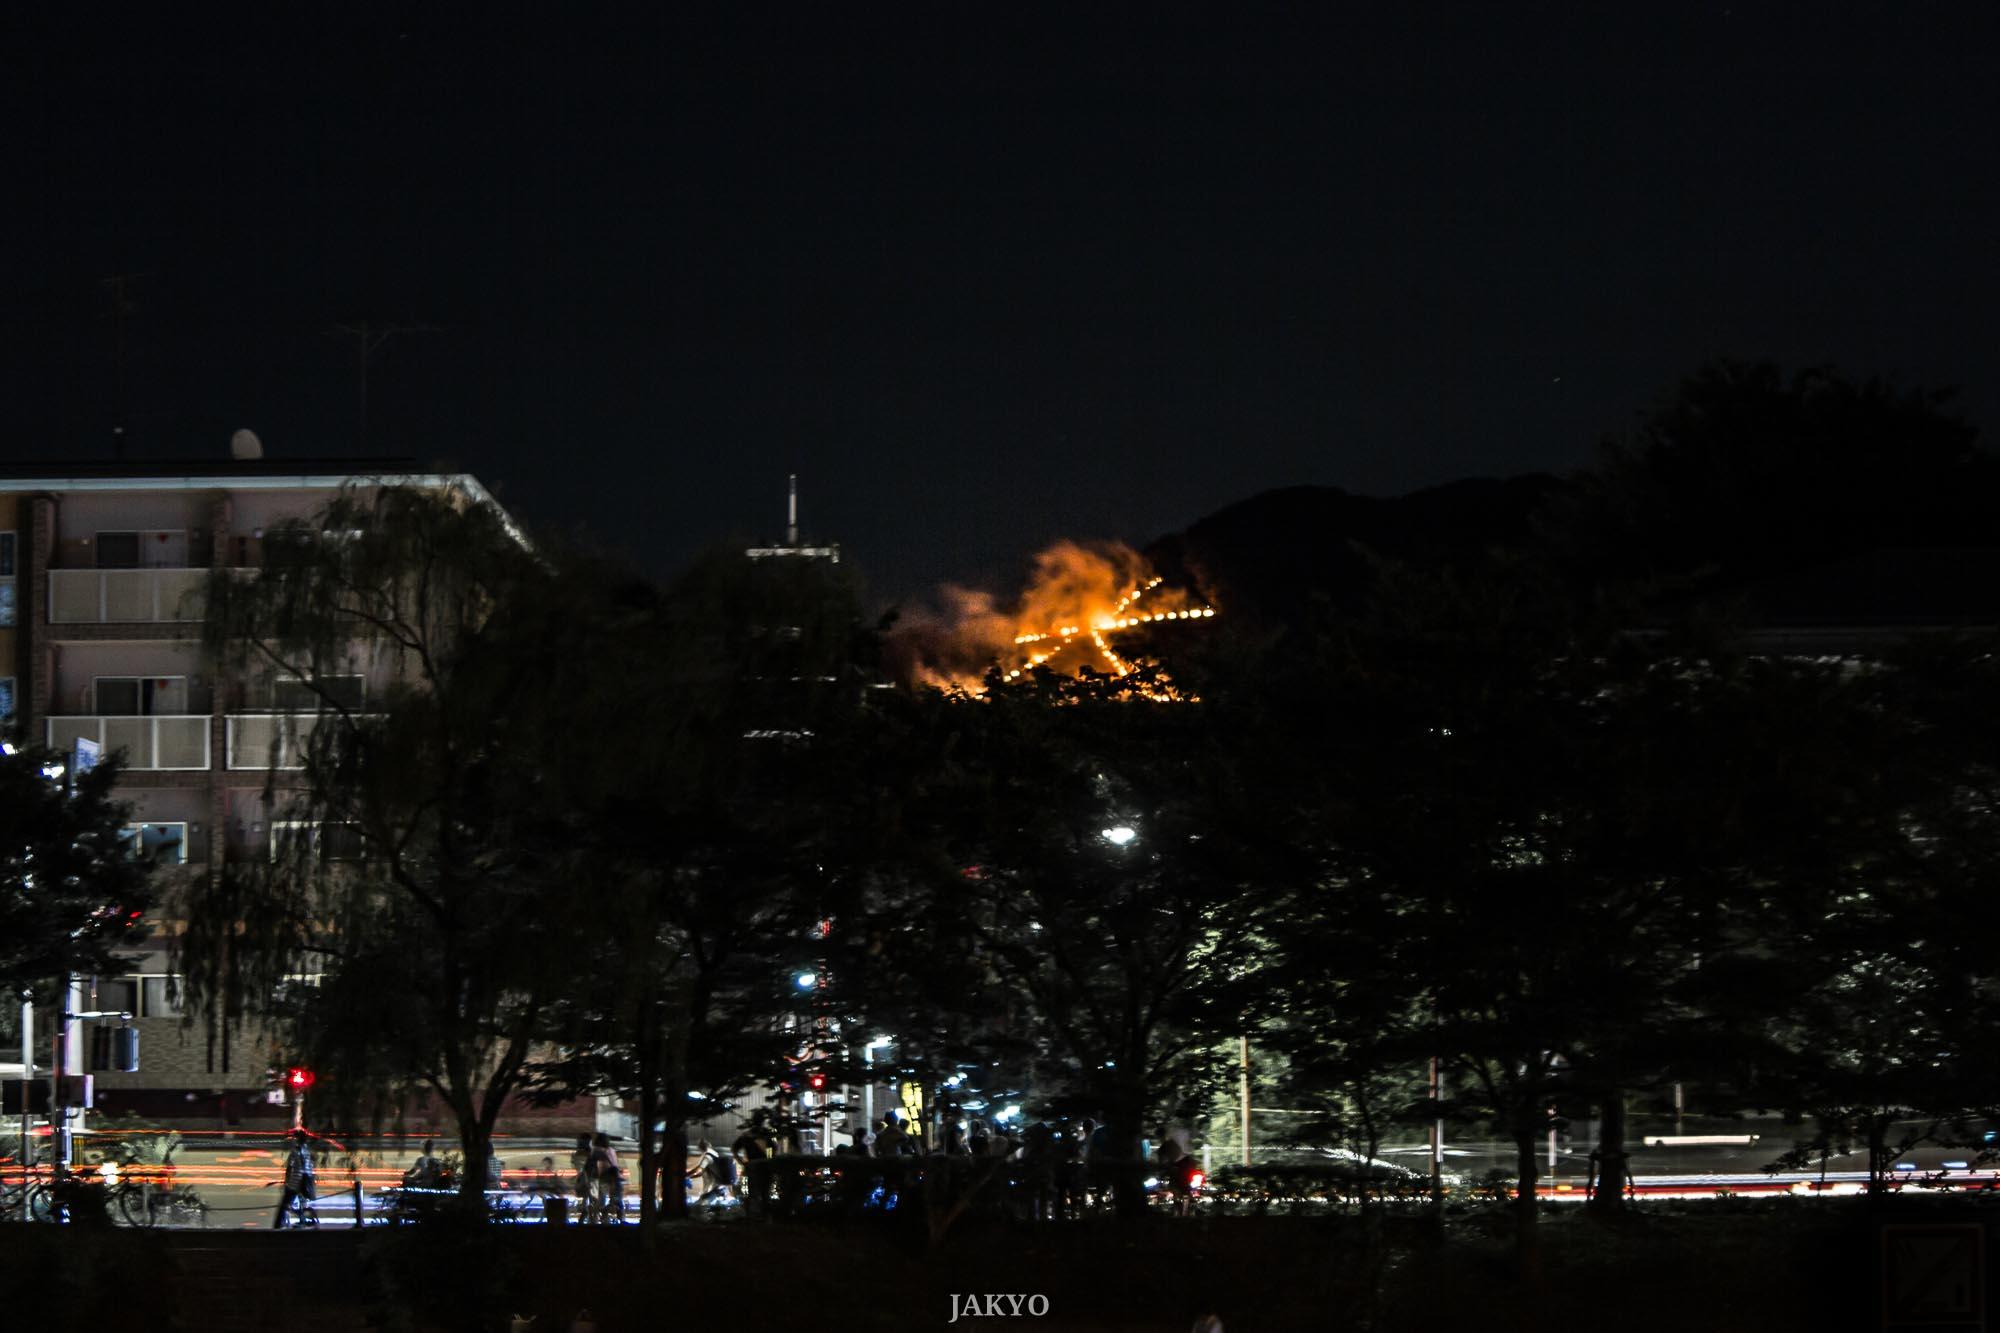 Daimonji, Fest, Festival, J2011-12, Japan, Kansai, Kioto, Kyoto, 京都, 大文字, 日本, 祭, 関西